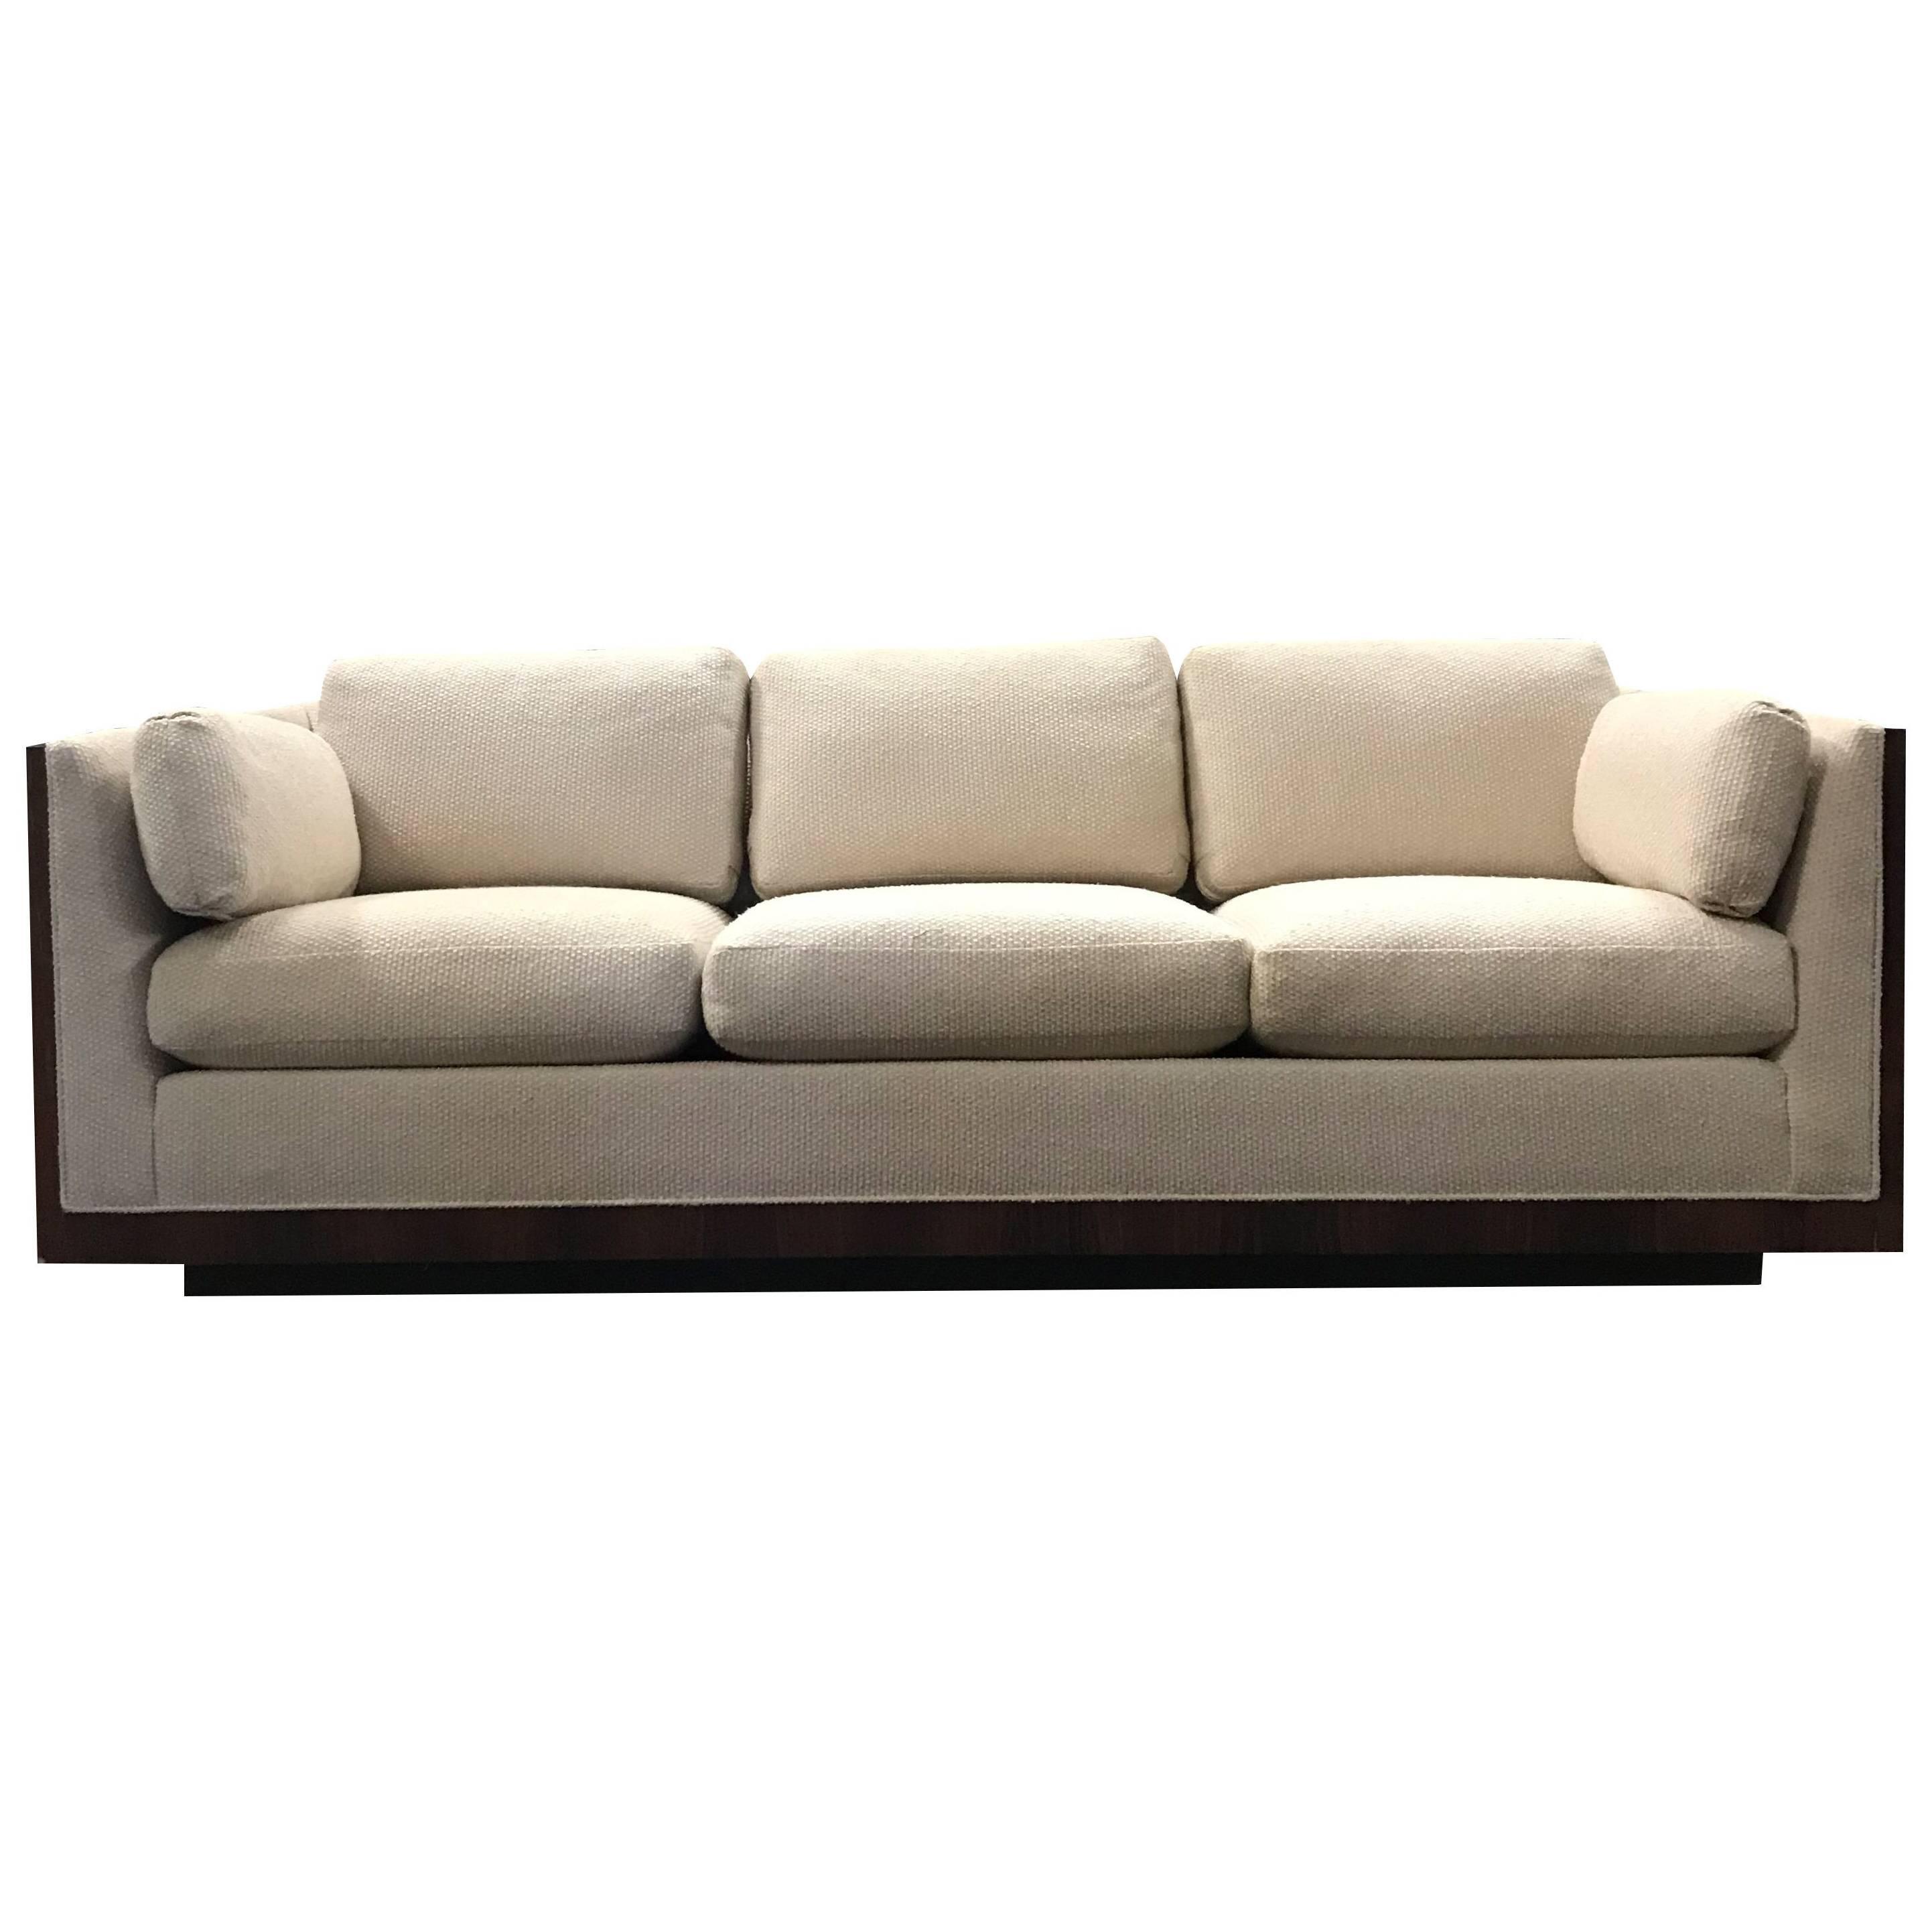 Milo Baughman For Thayer Coggin Case Sofa In Rosewood